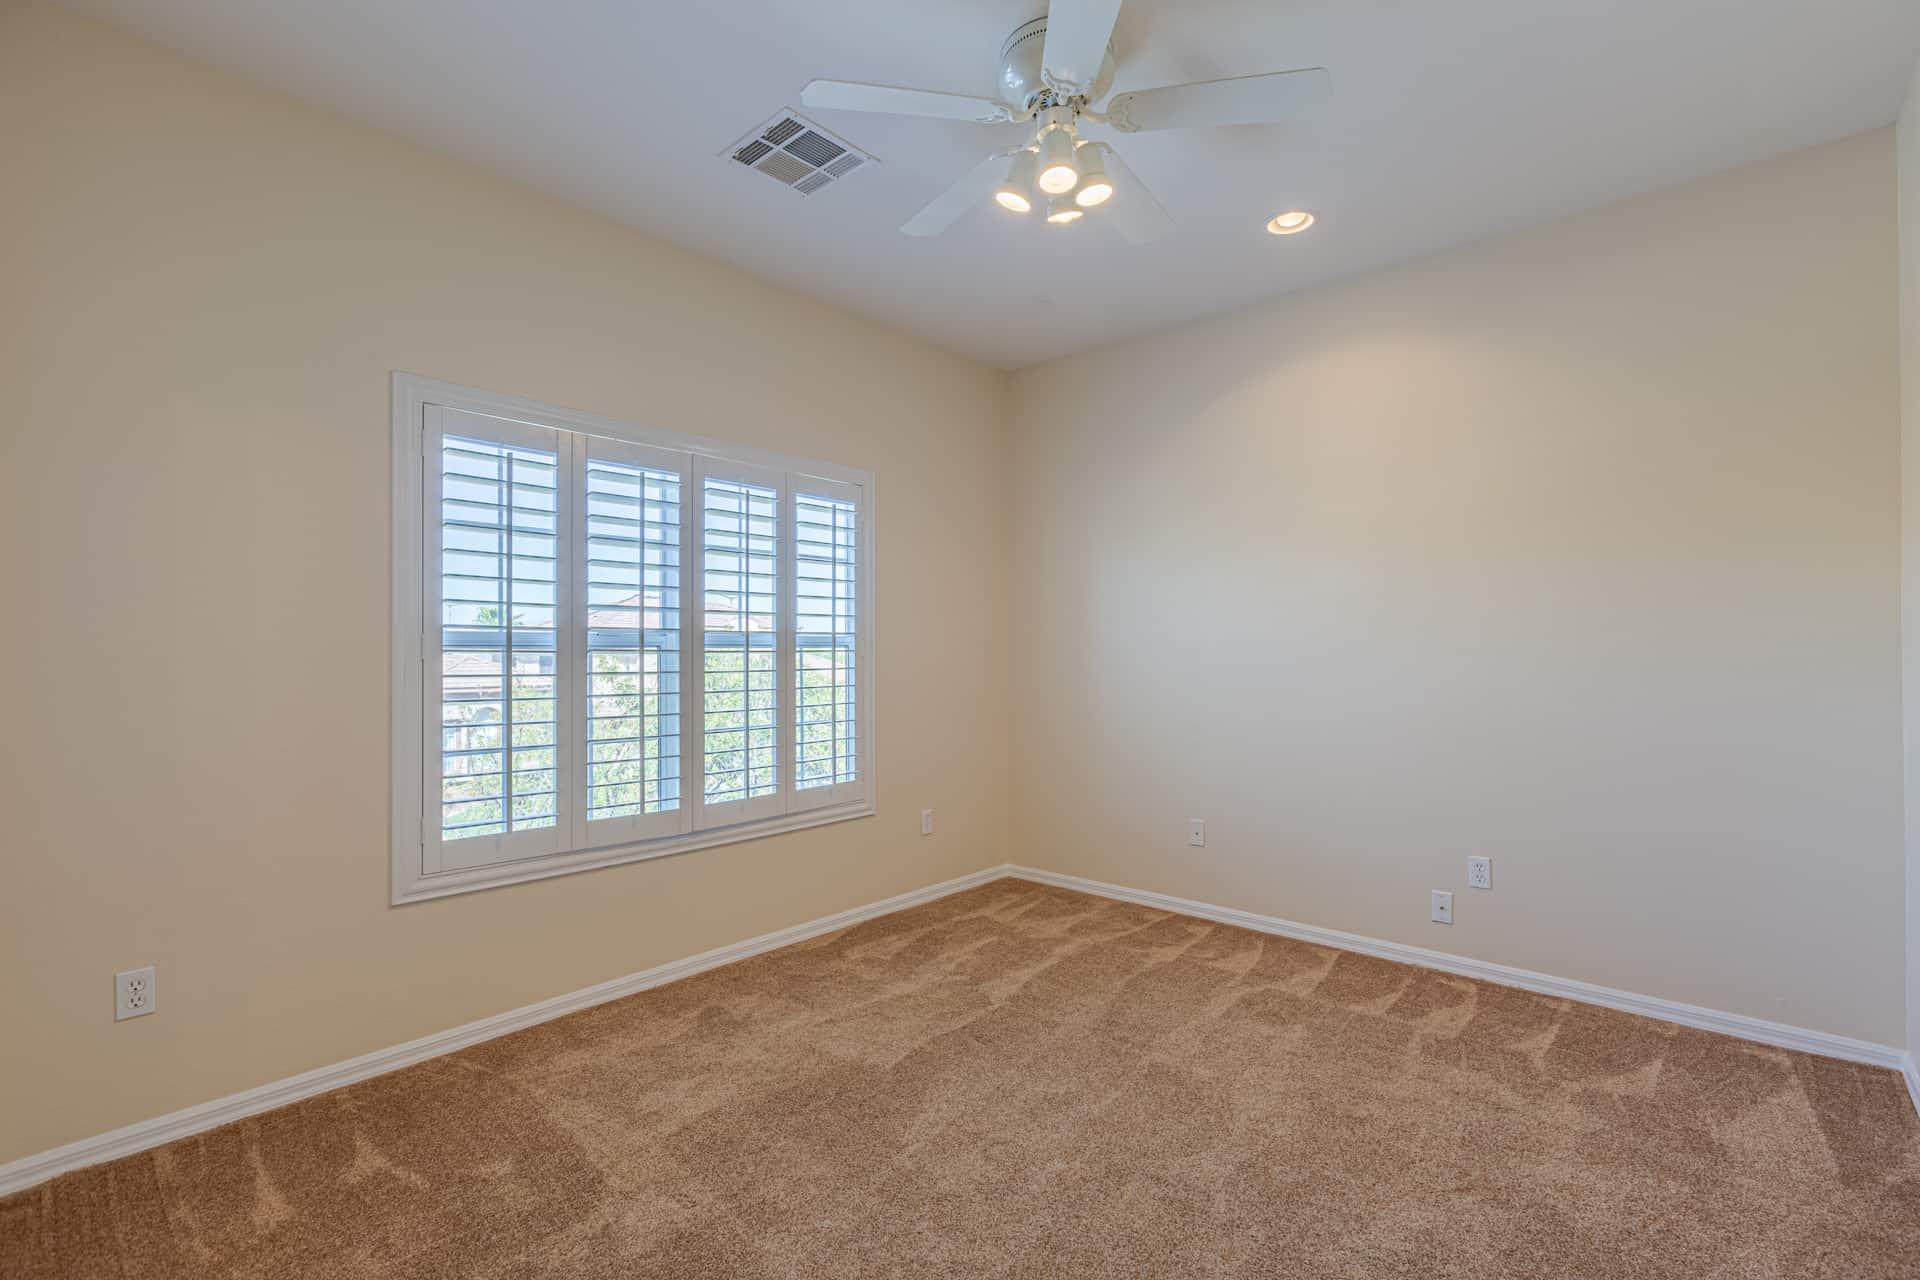 las-vegas-luxry-real-estate-realtor-rob-jensen-company-10729-grey-havens-court-willow-creek4257